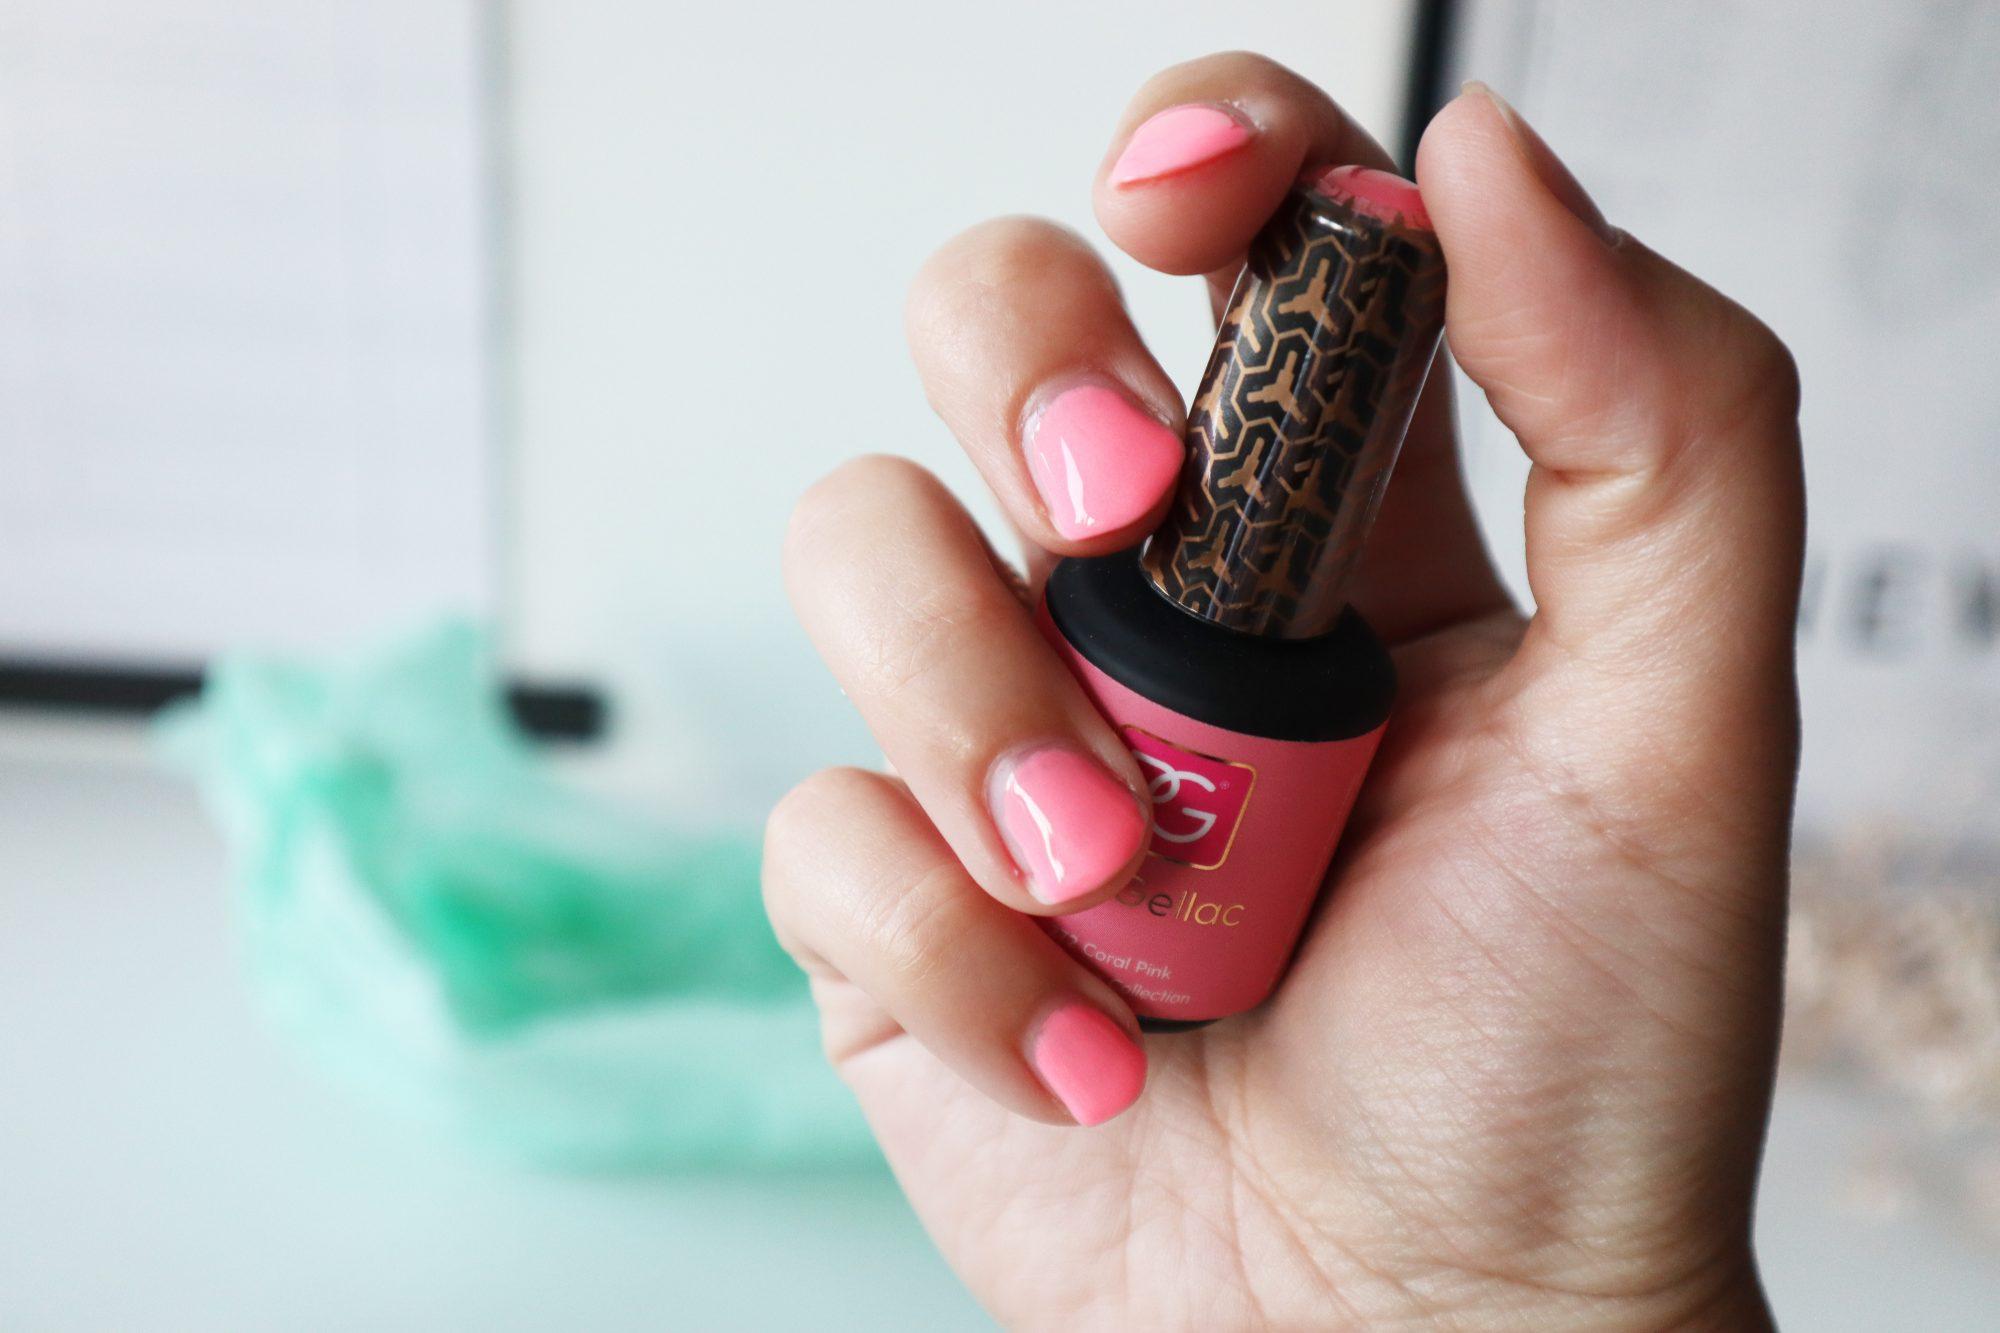 Pink Gellac Miami Vibe